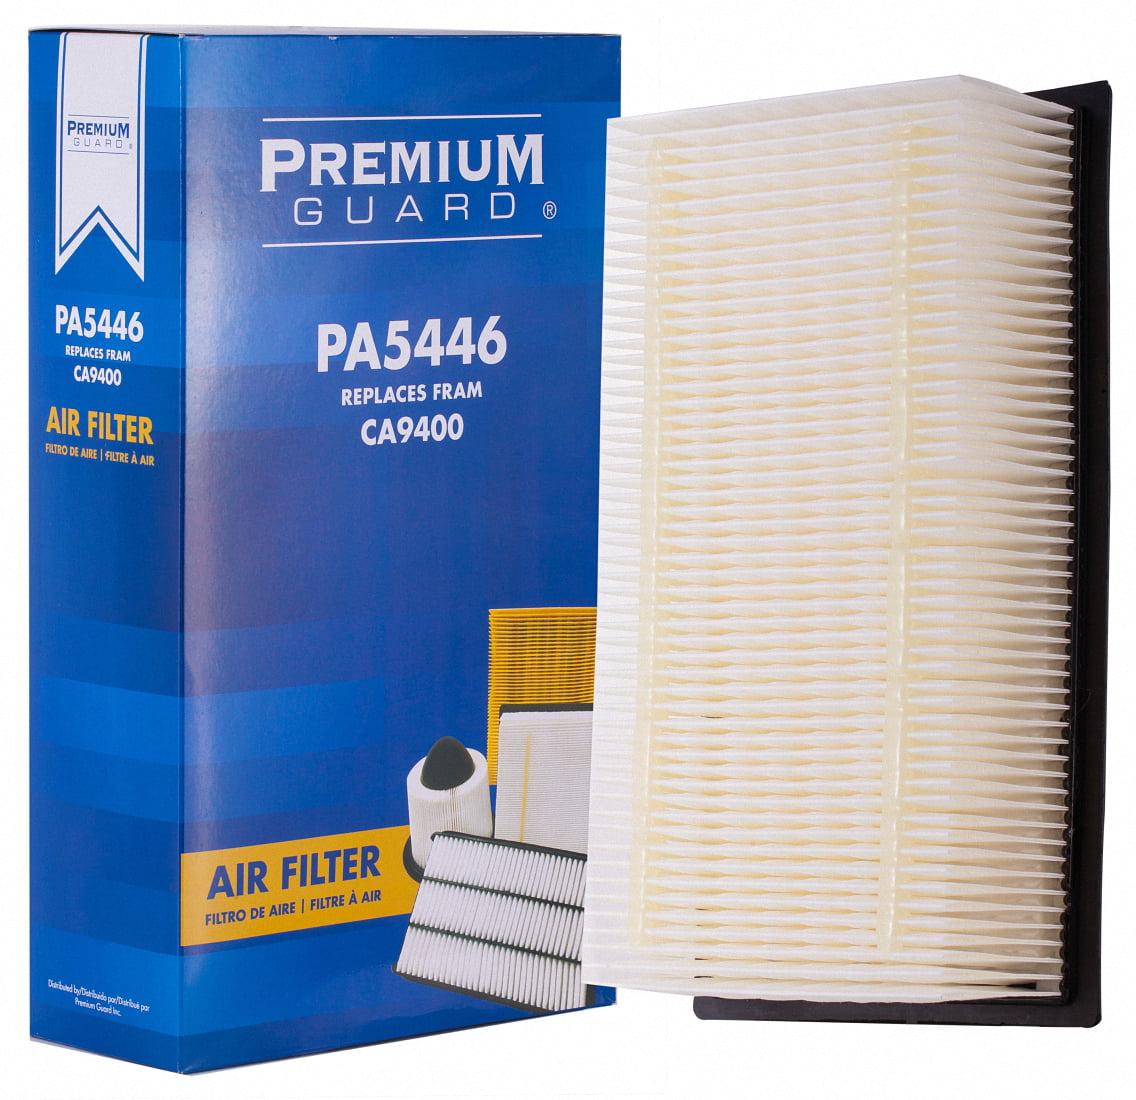 HONDA ACURA ENGINE AIR FILTER FOR ACURA CL TL HONDA ACCORD OE 17220-P8C-A00